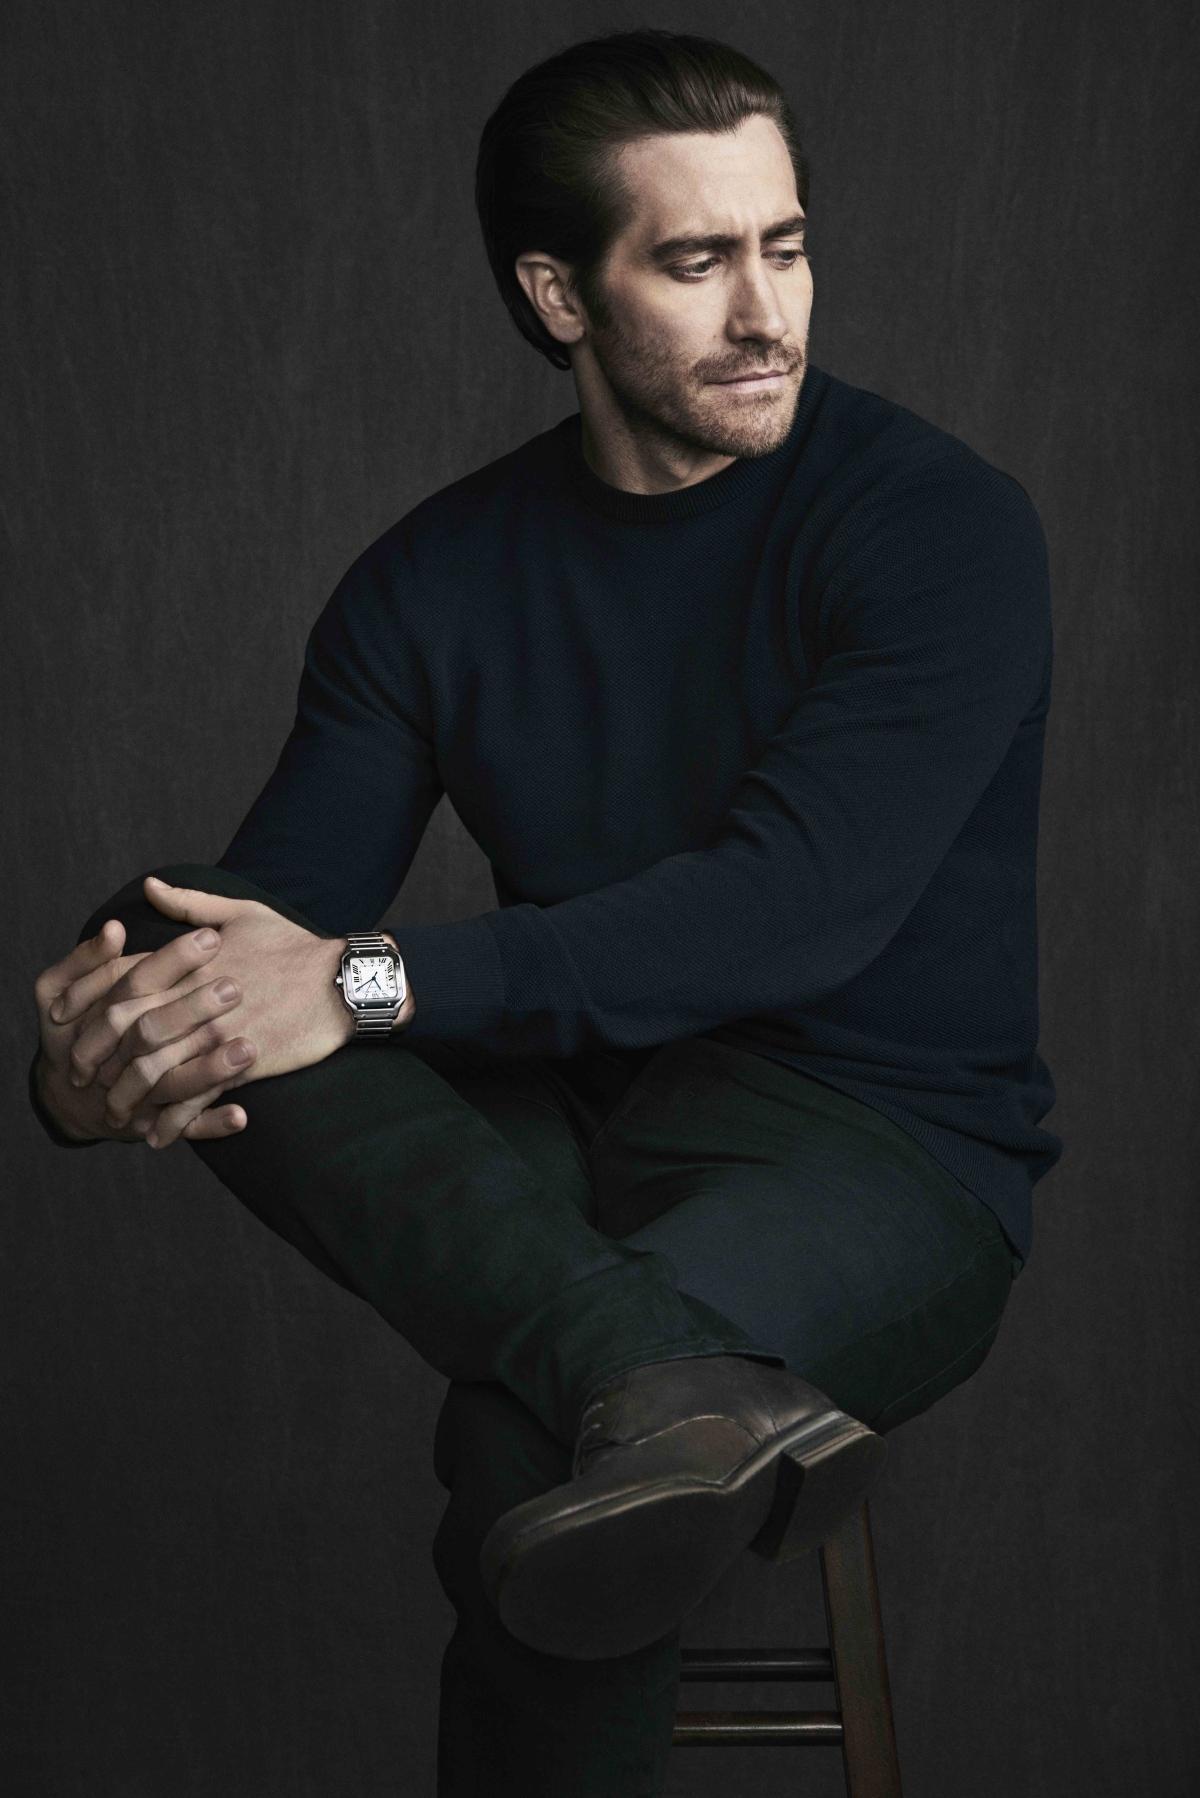 1MB_Jake Gyllenhaal - Matthew Brookes@Cartier (002)